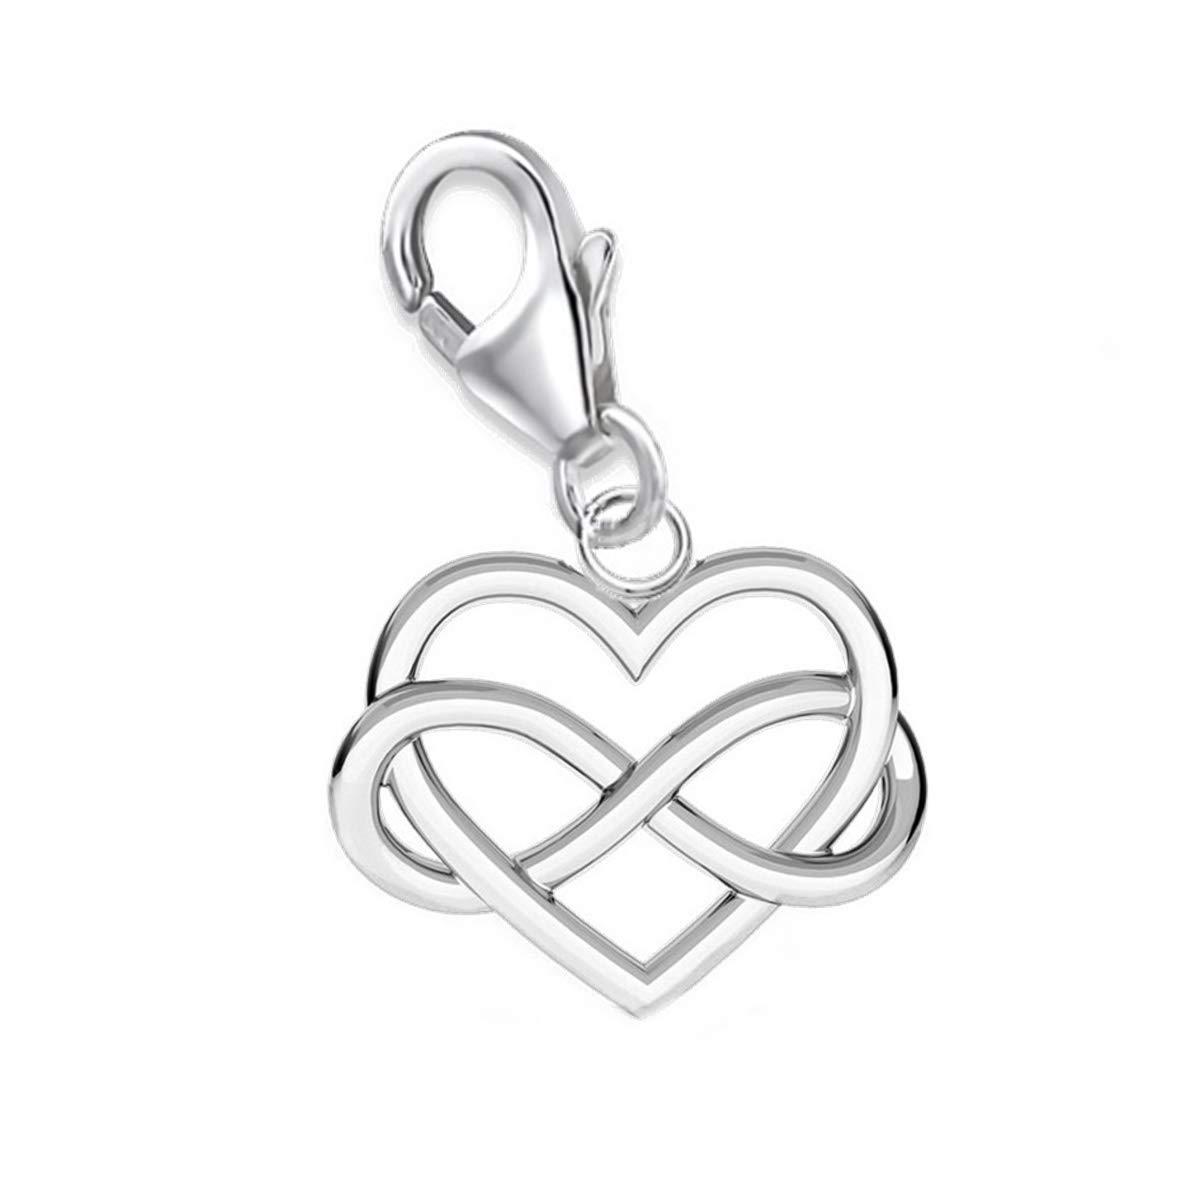 Unendlichkeit Herz Charm 925 Echt Silber Anhänger Damen Mädchen Geschenkidee GH1a AH-0307-02